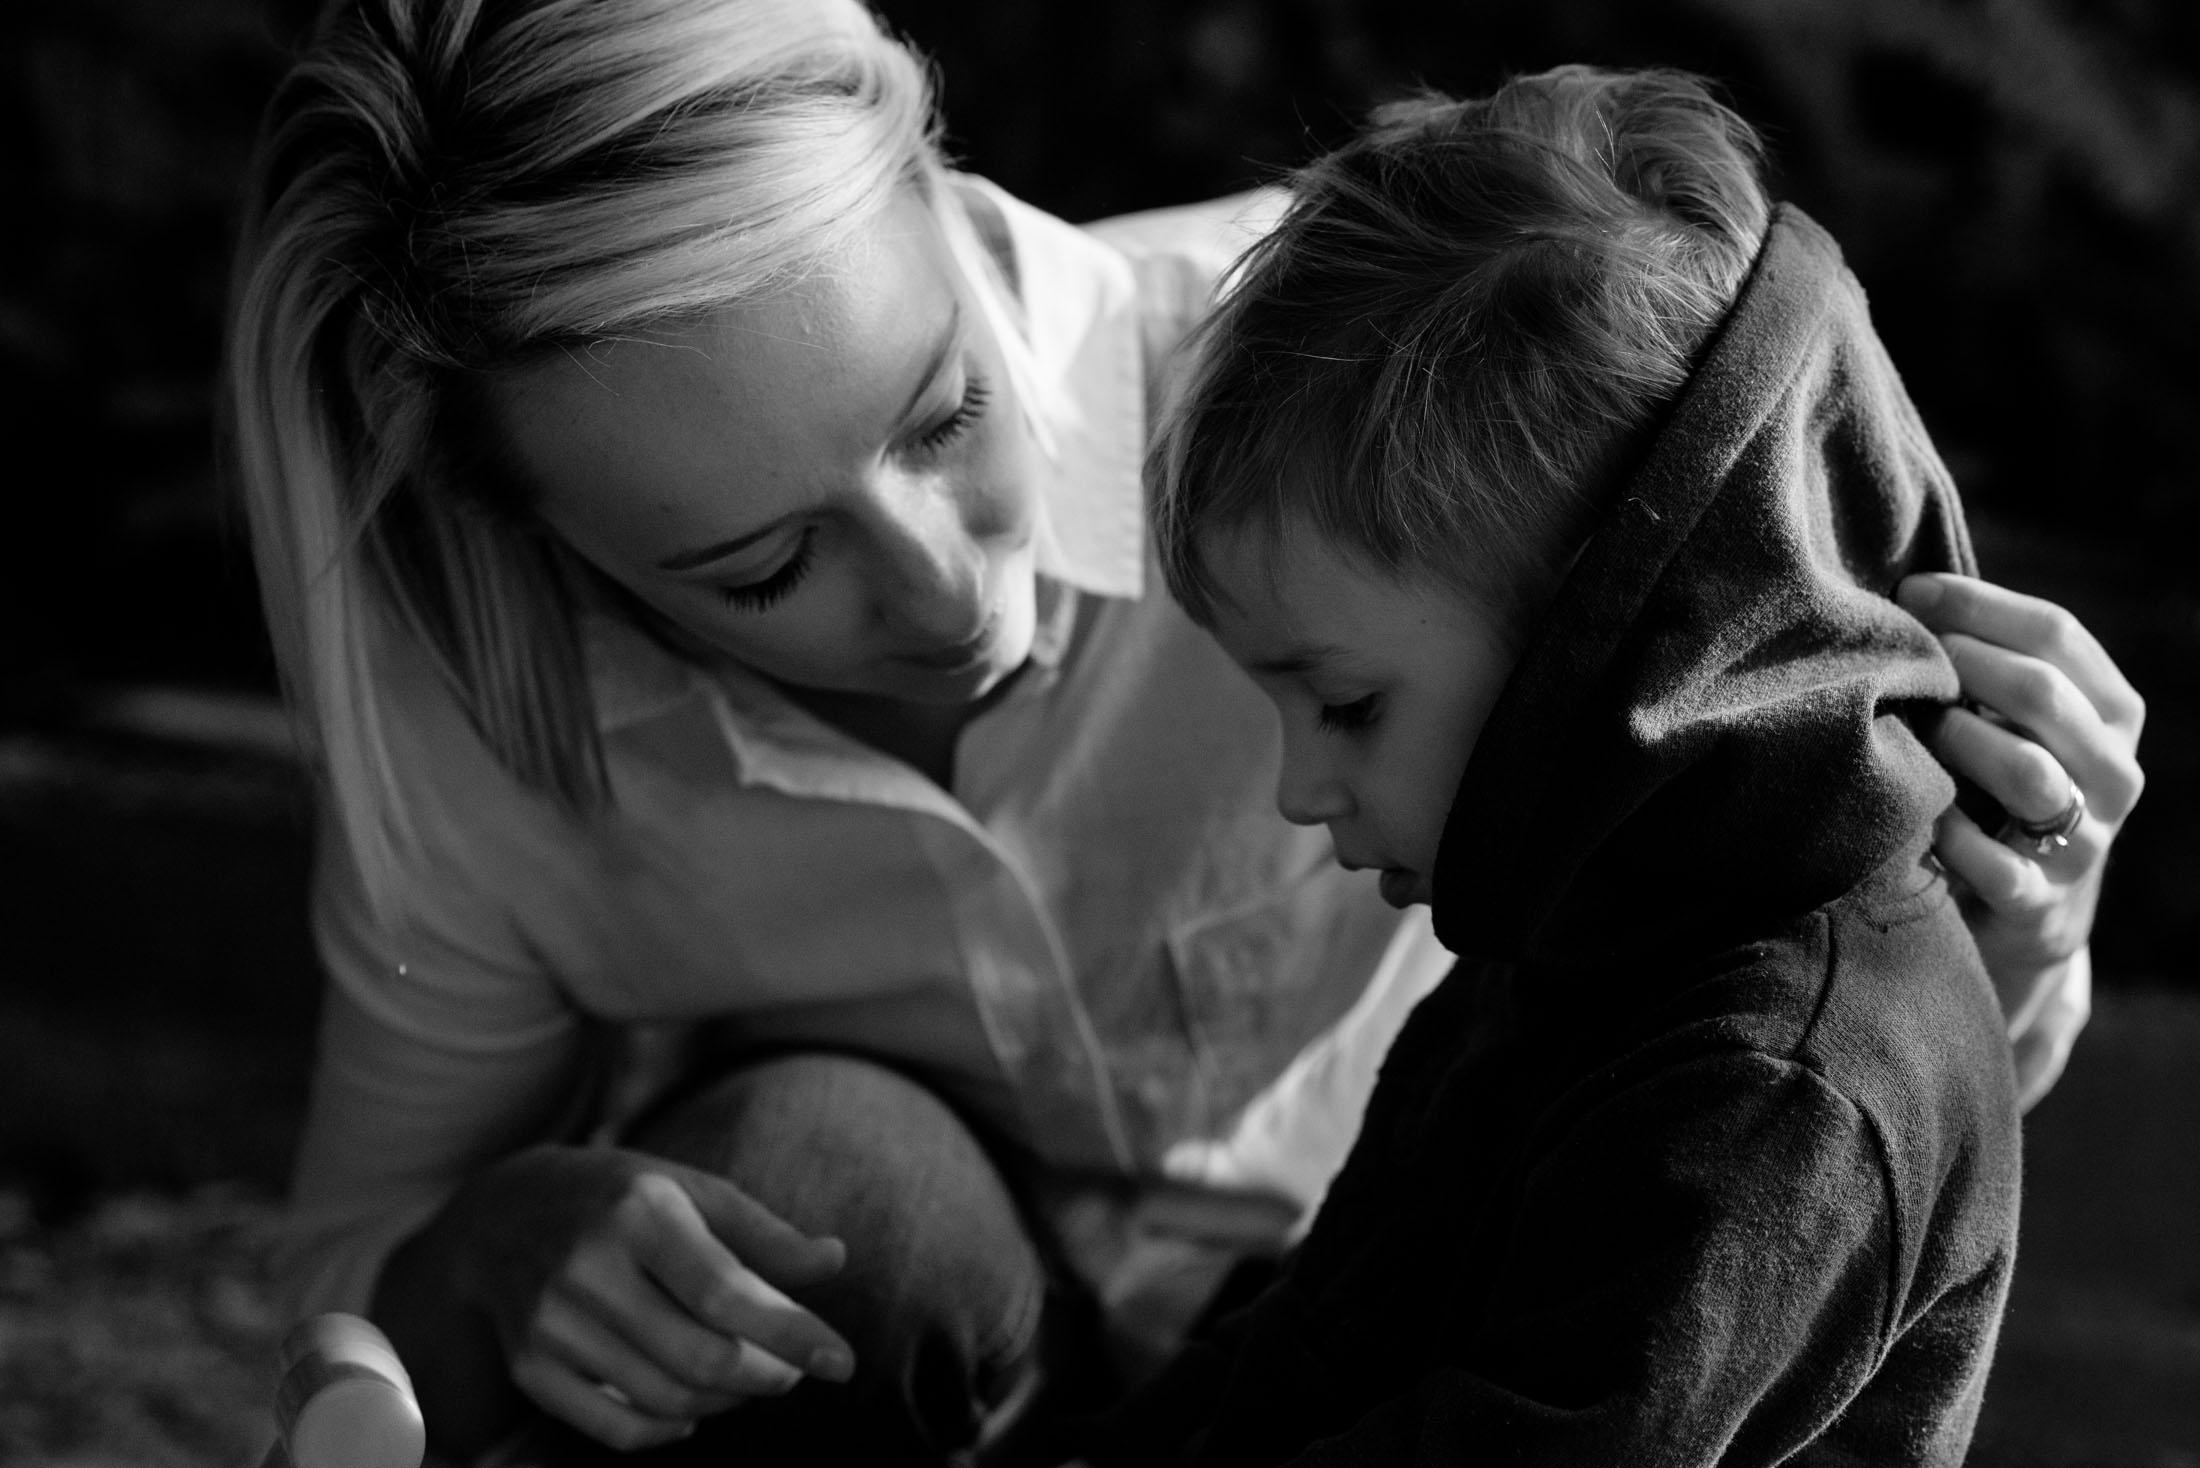 Laing_Family-Photography-unposed14.JPG